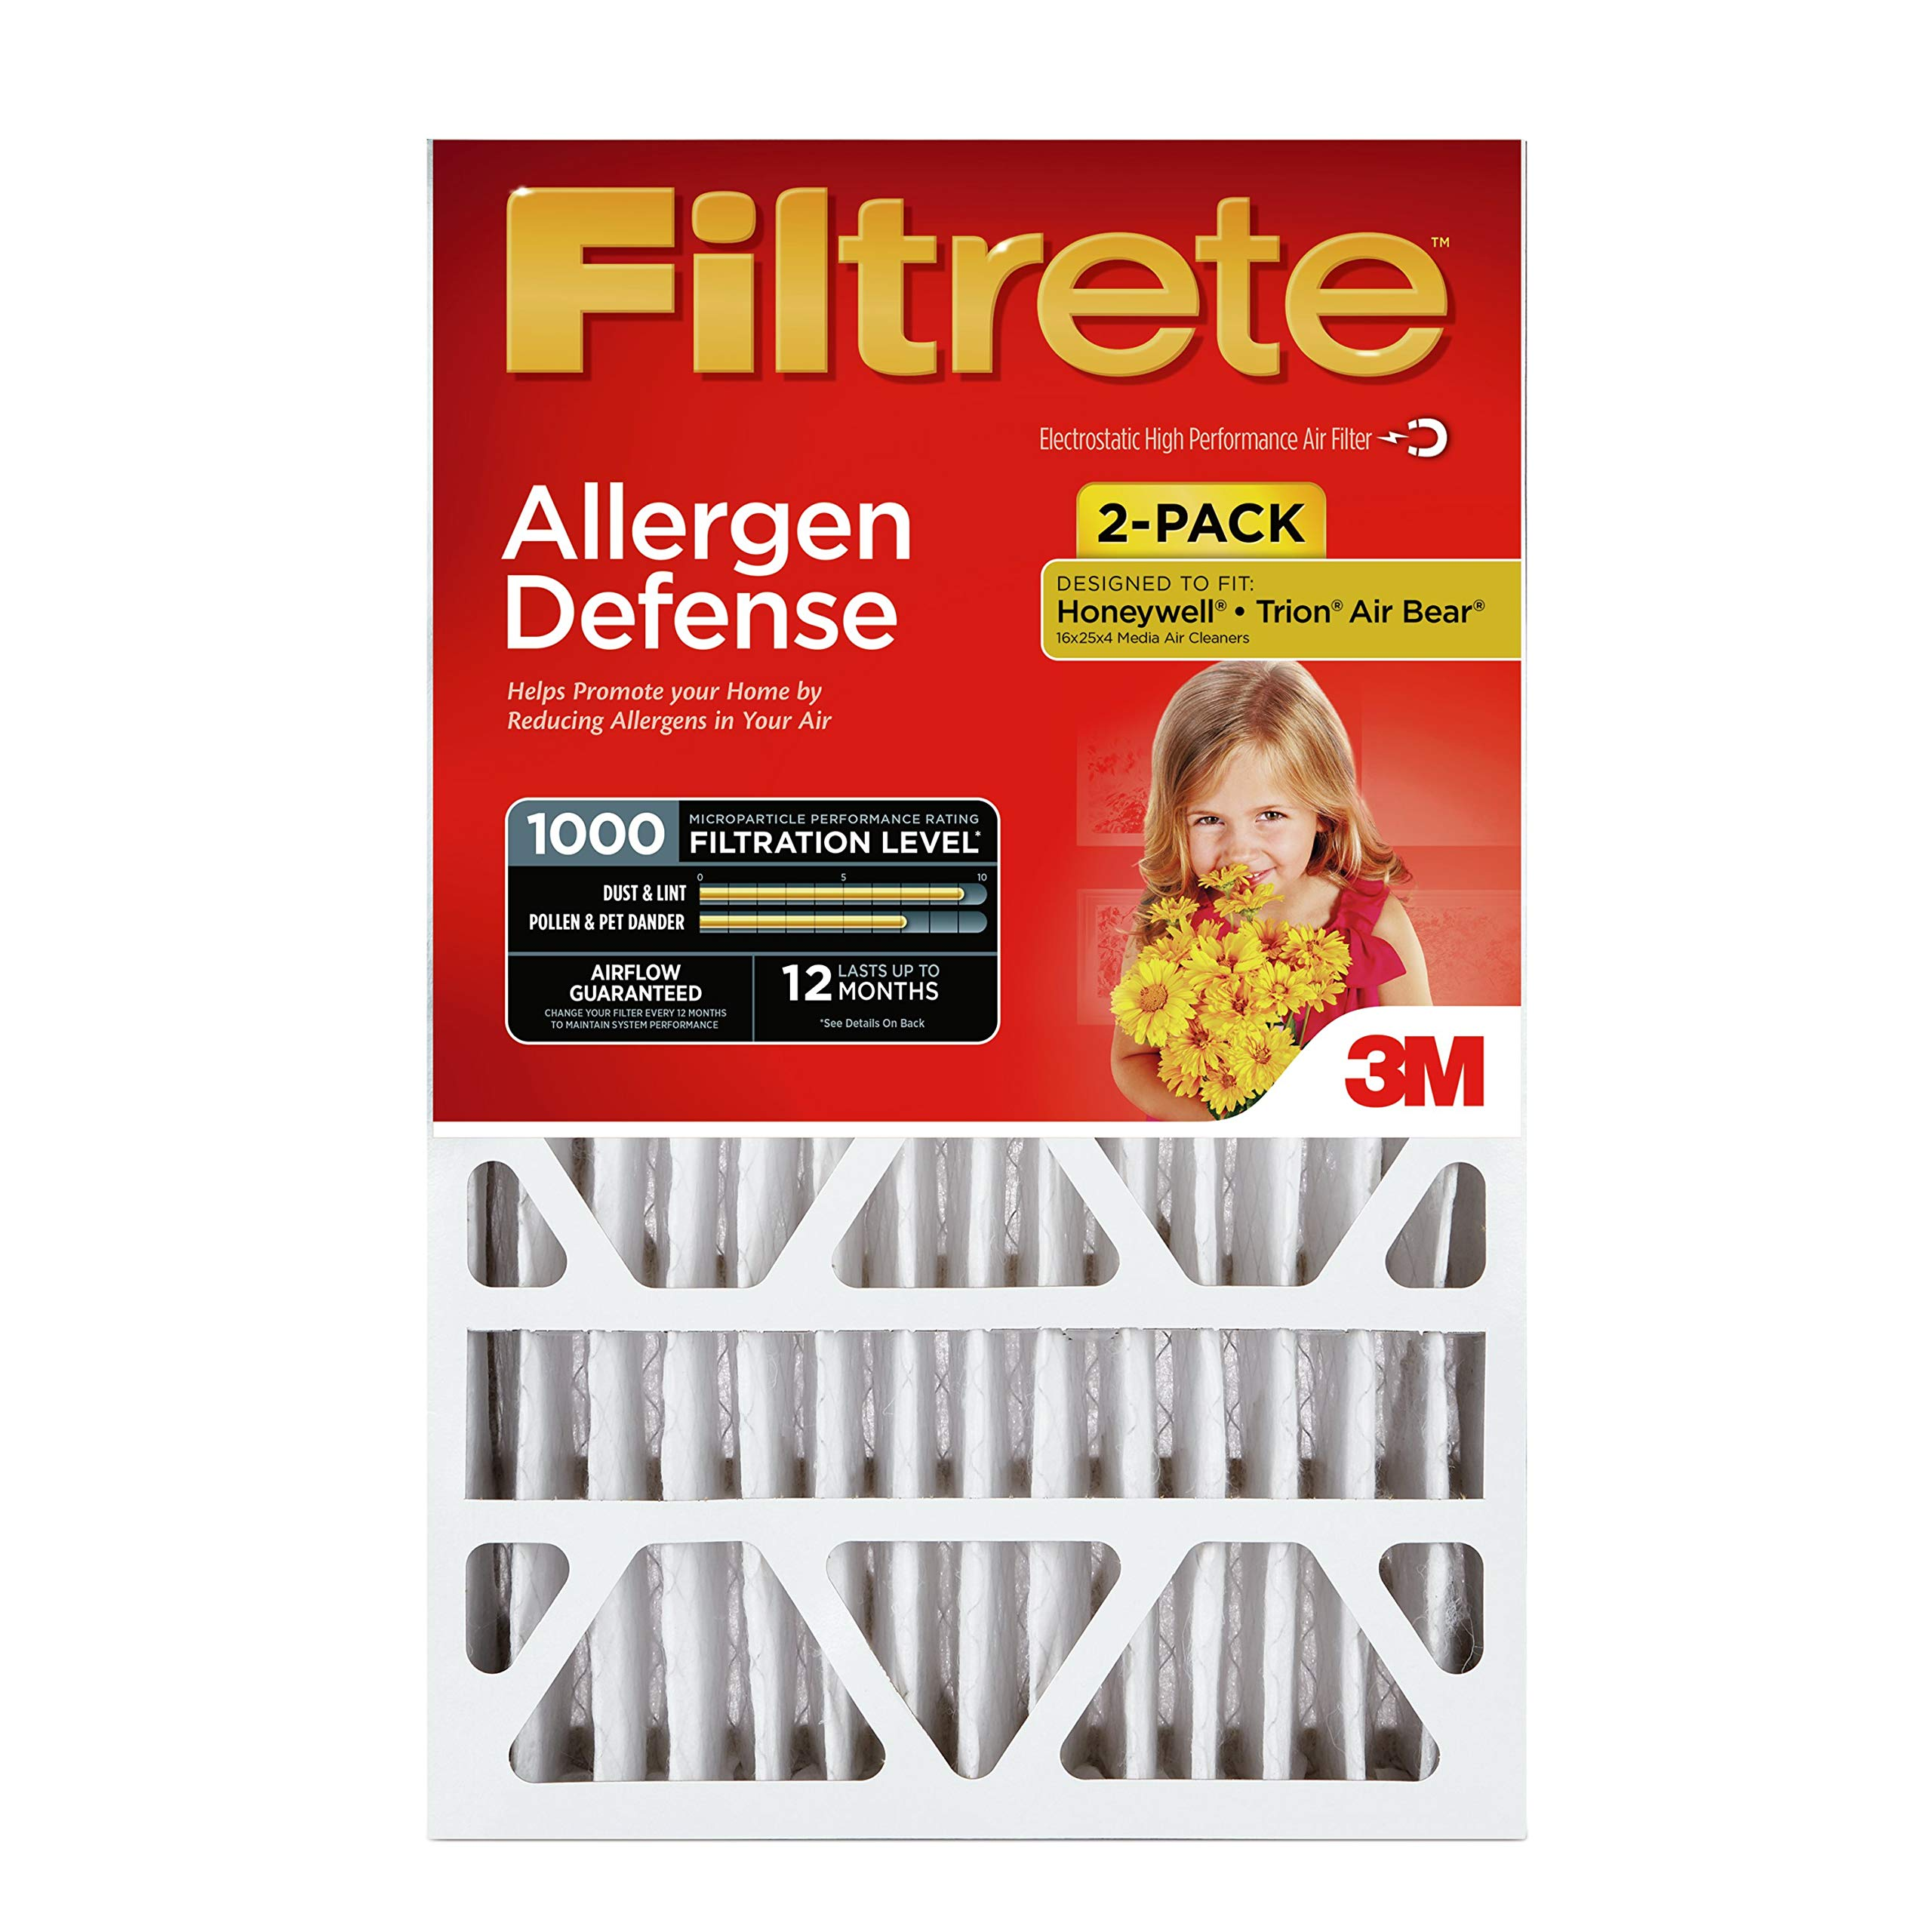 Filtrete 20x20x4, AC Furnace Air Filter, MPR 1000 DP, Micro Allergen Defense Deep Pleat, 2-Pack